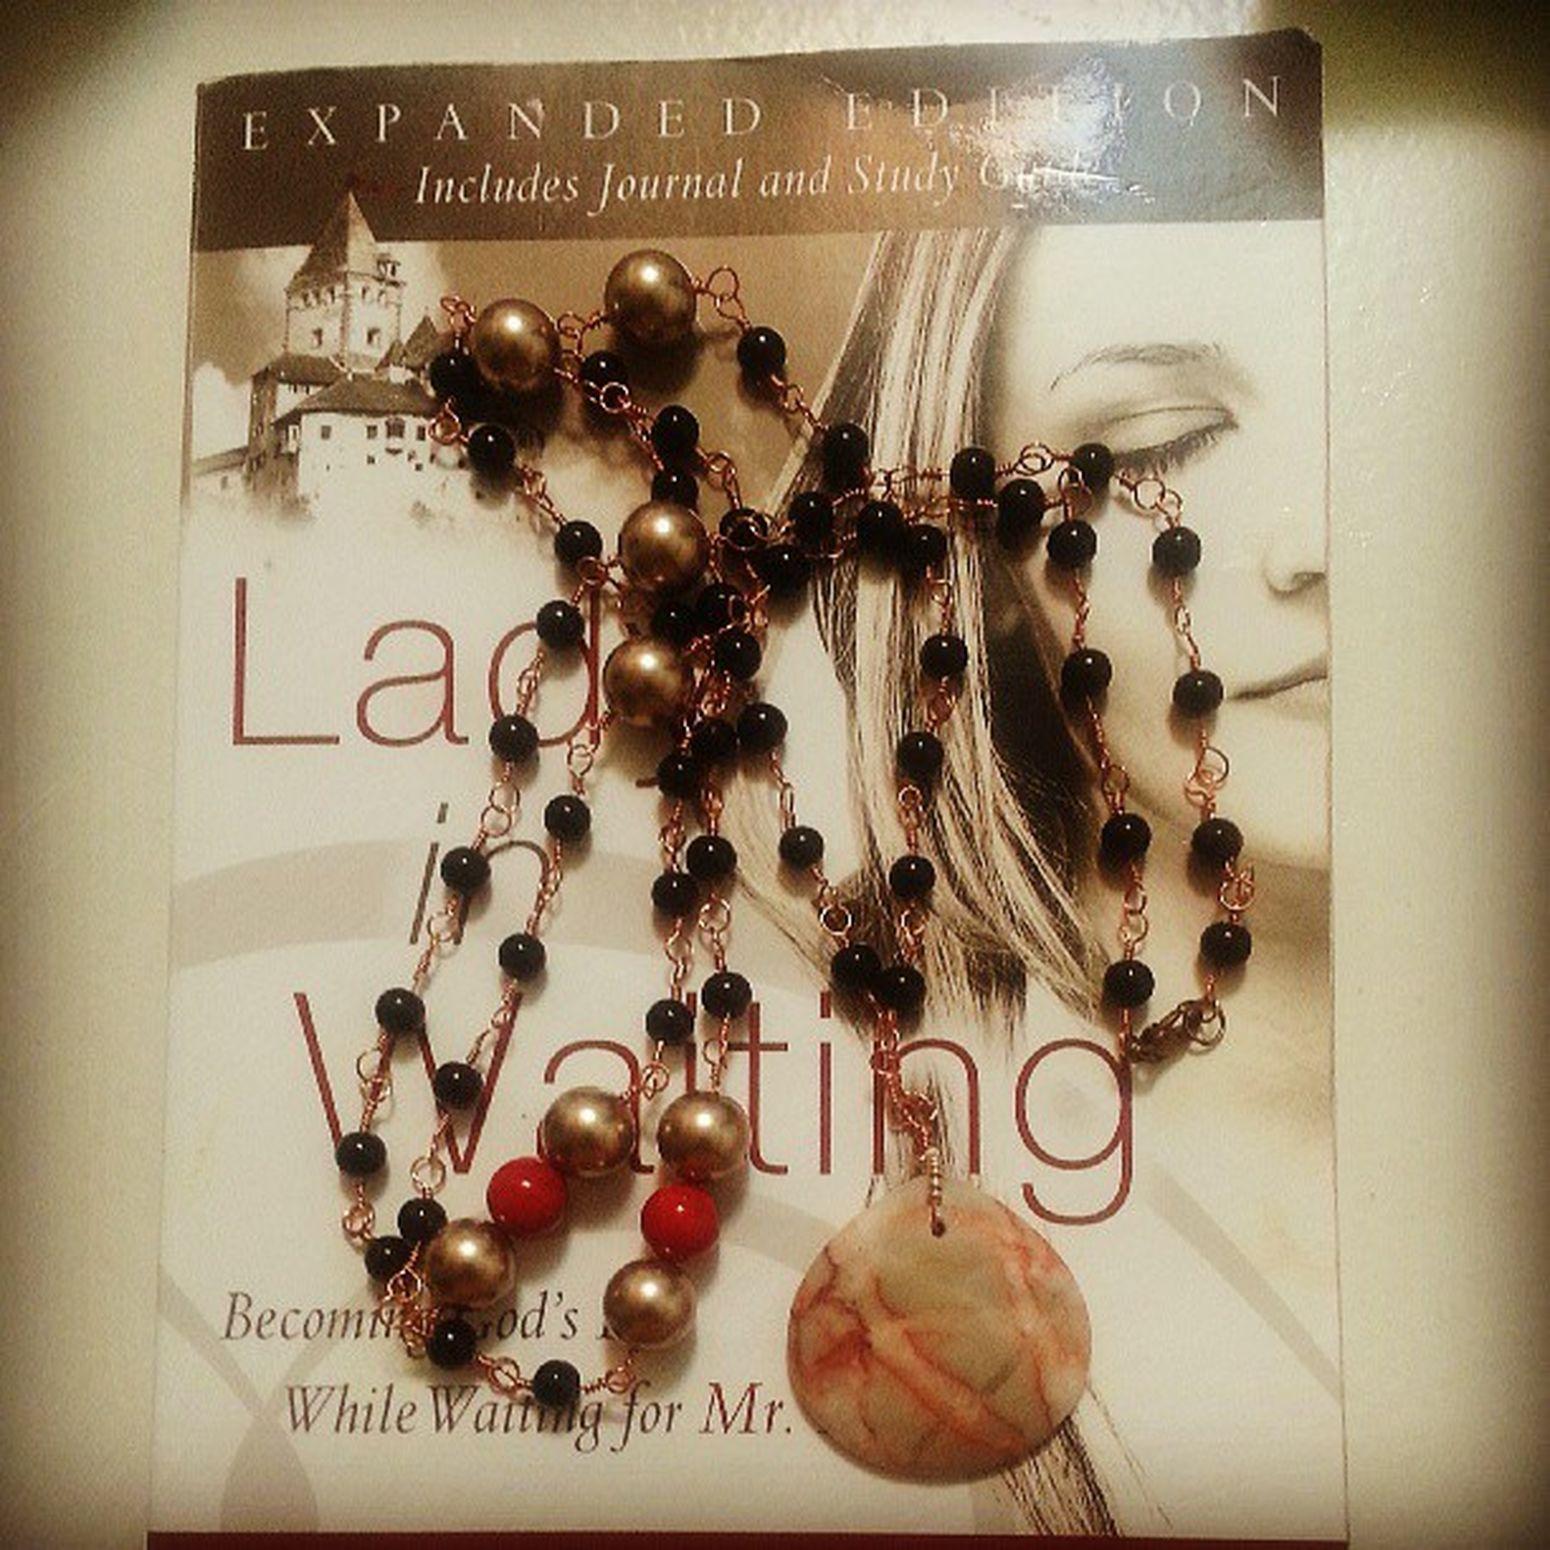 LongChain Necklace IJustMadeThis Imadethis jewelry gangnamstyle style diy beads book ladyInWaiting christian